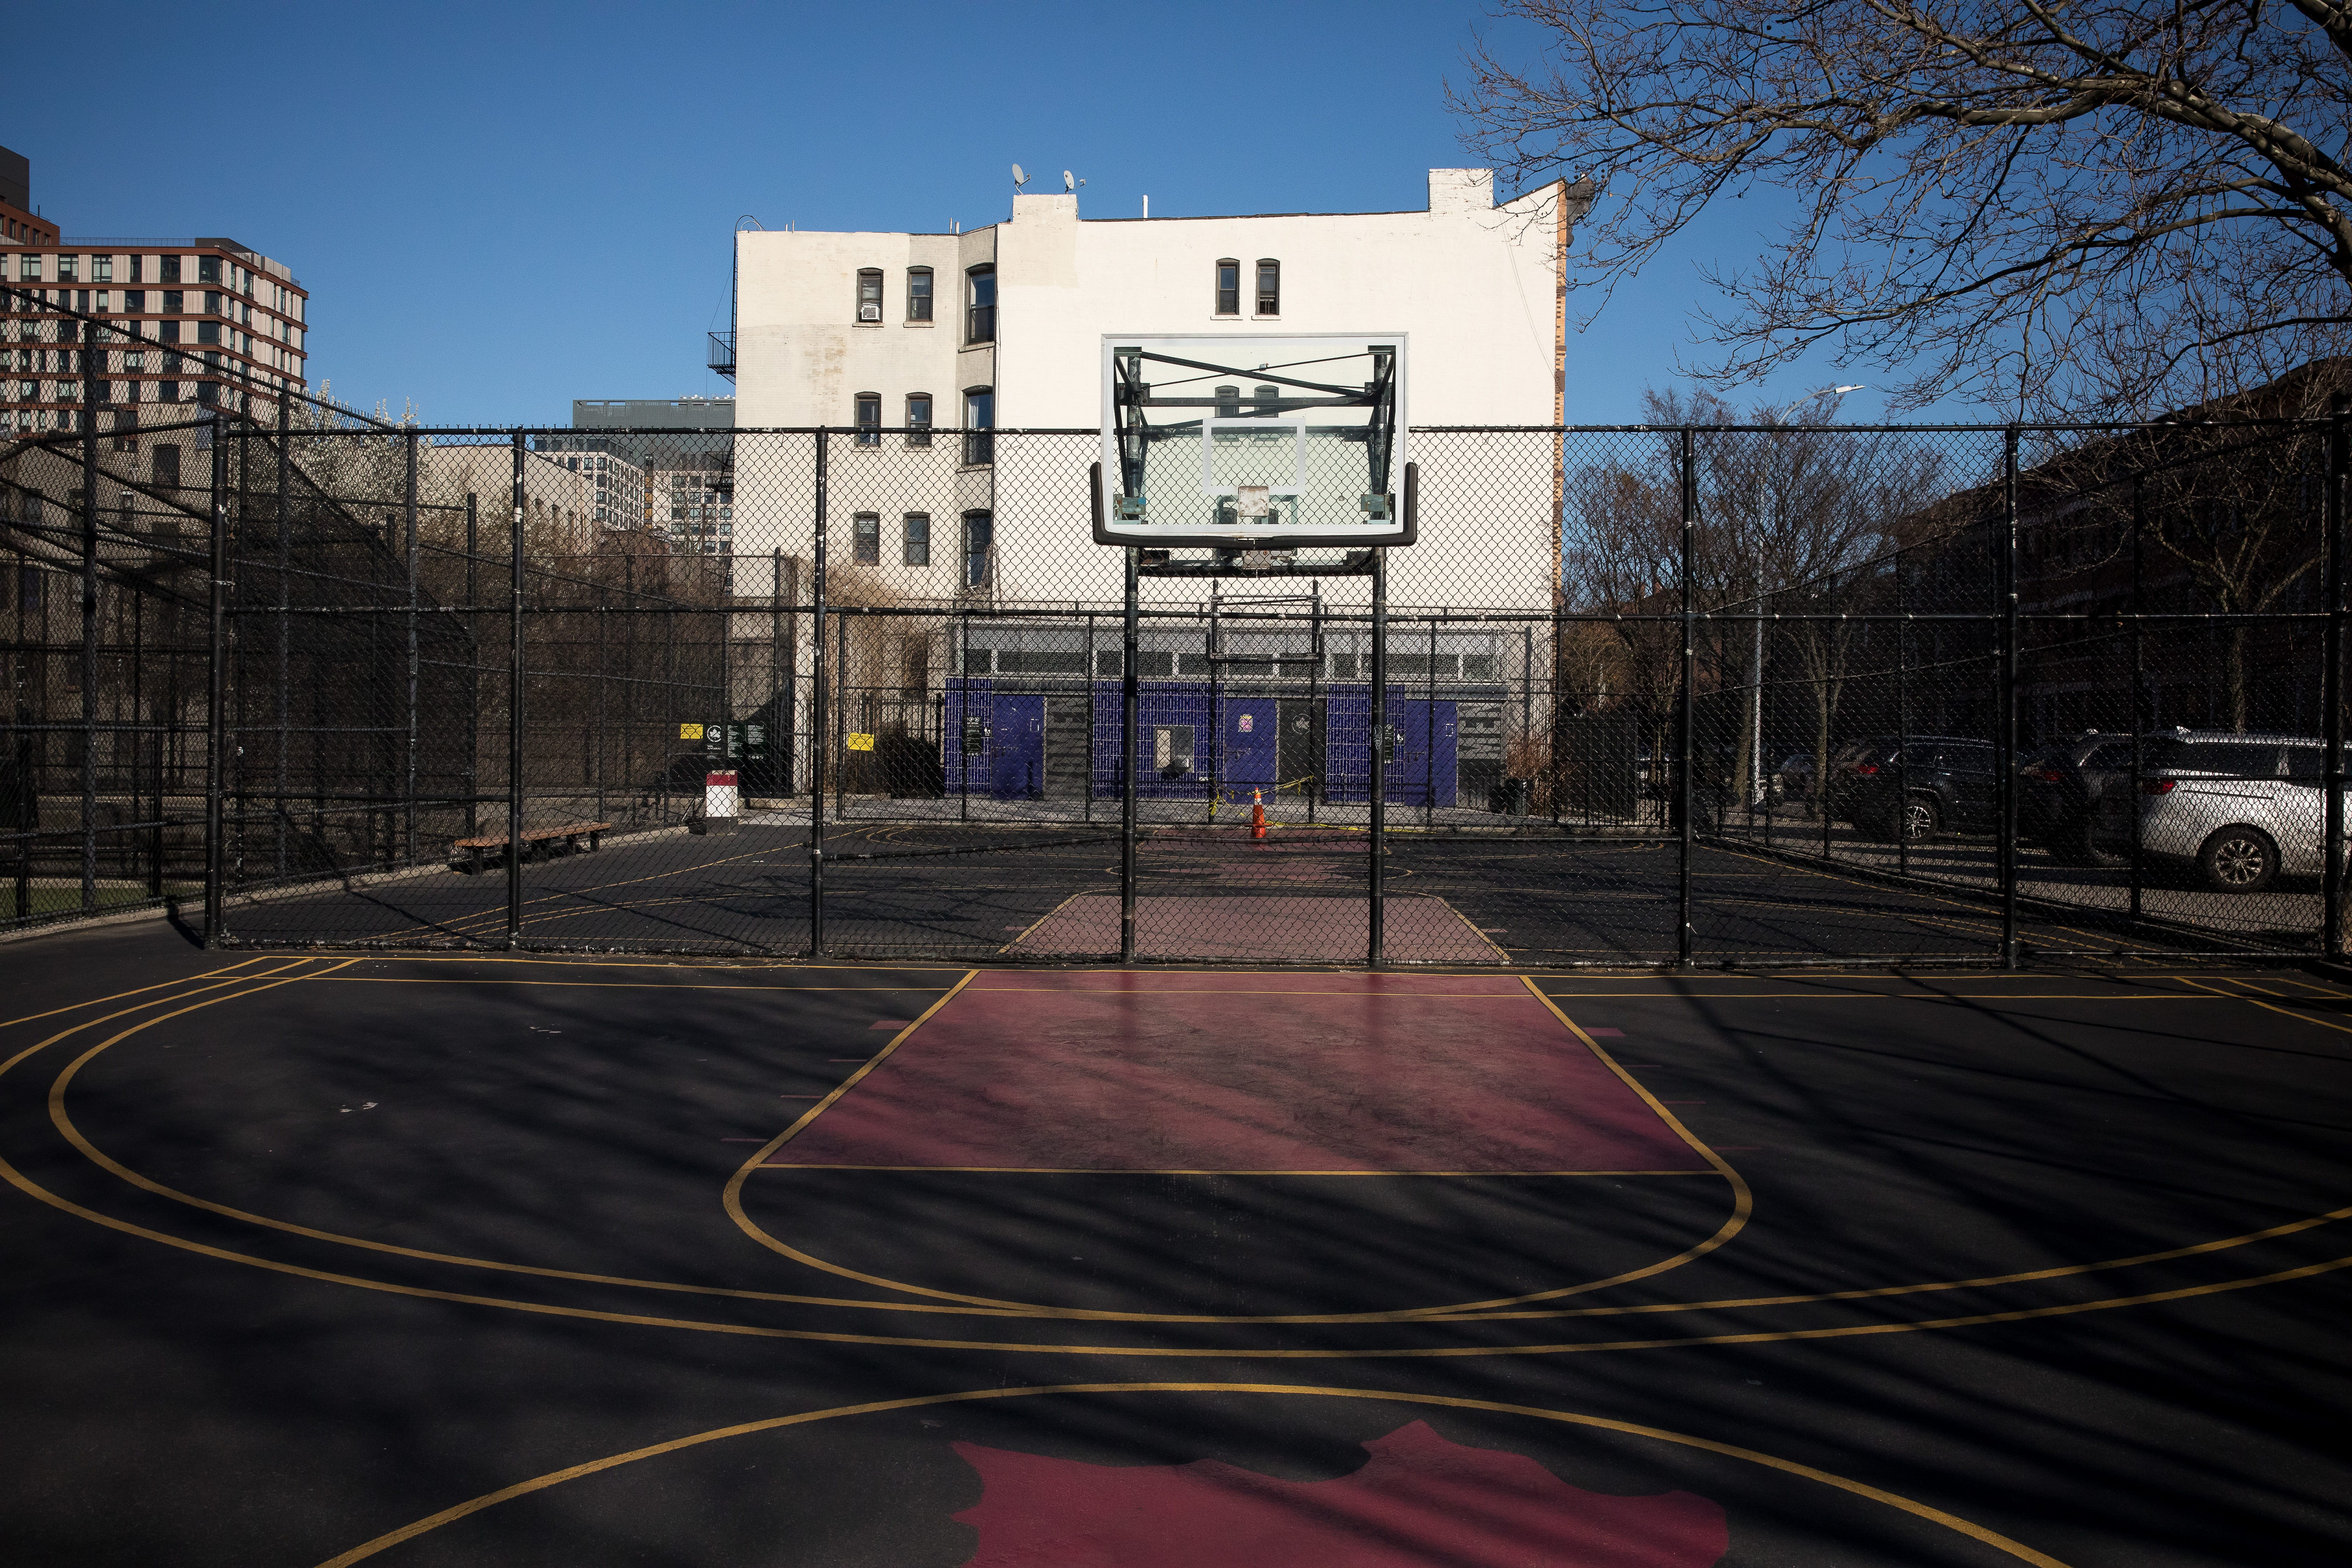 Basketball Hoops Taken Down In Major